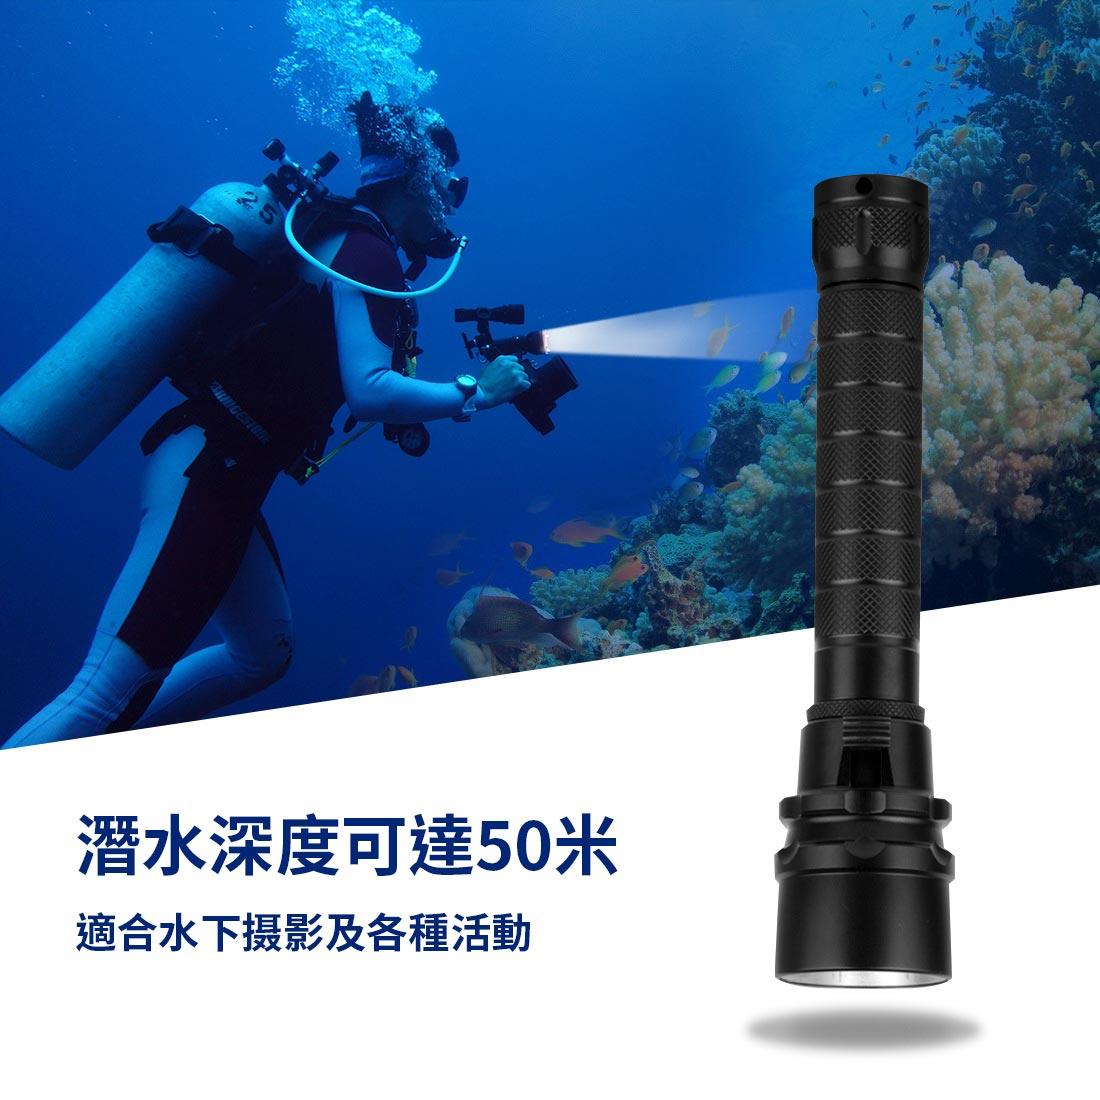 Puluz 3800lm 高亮鋁製潛水手電筒(50m)